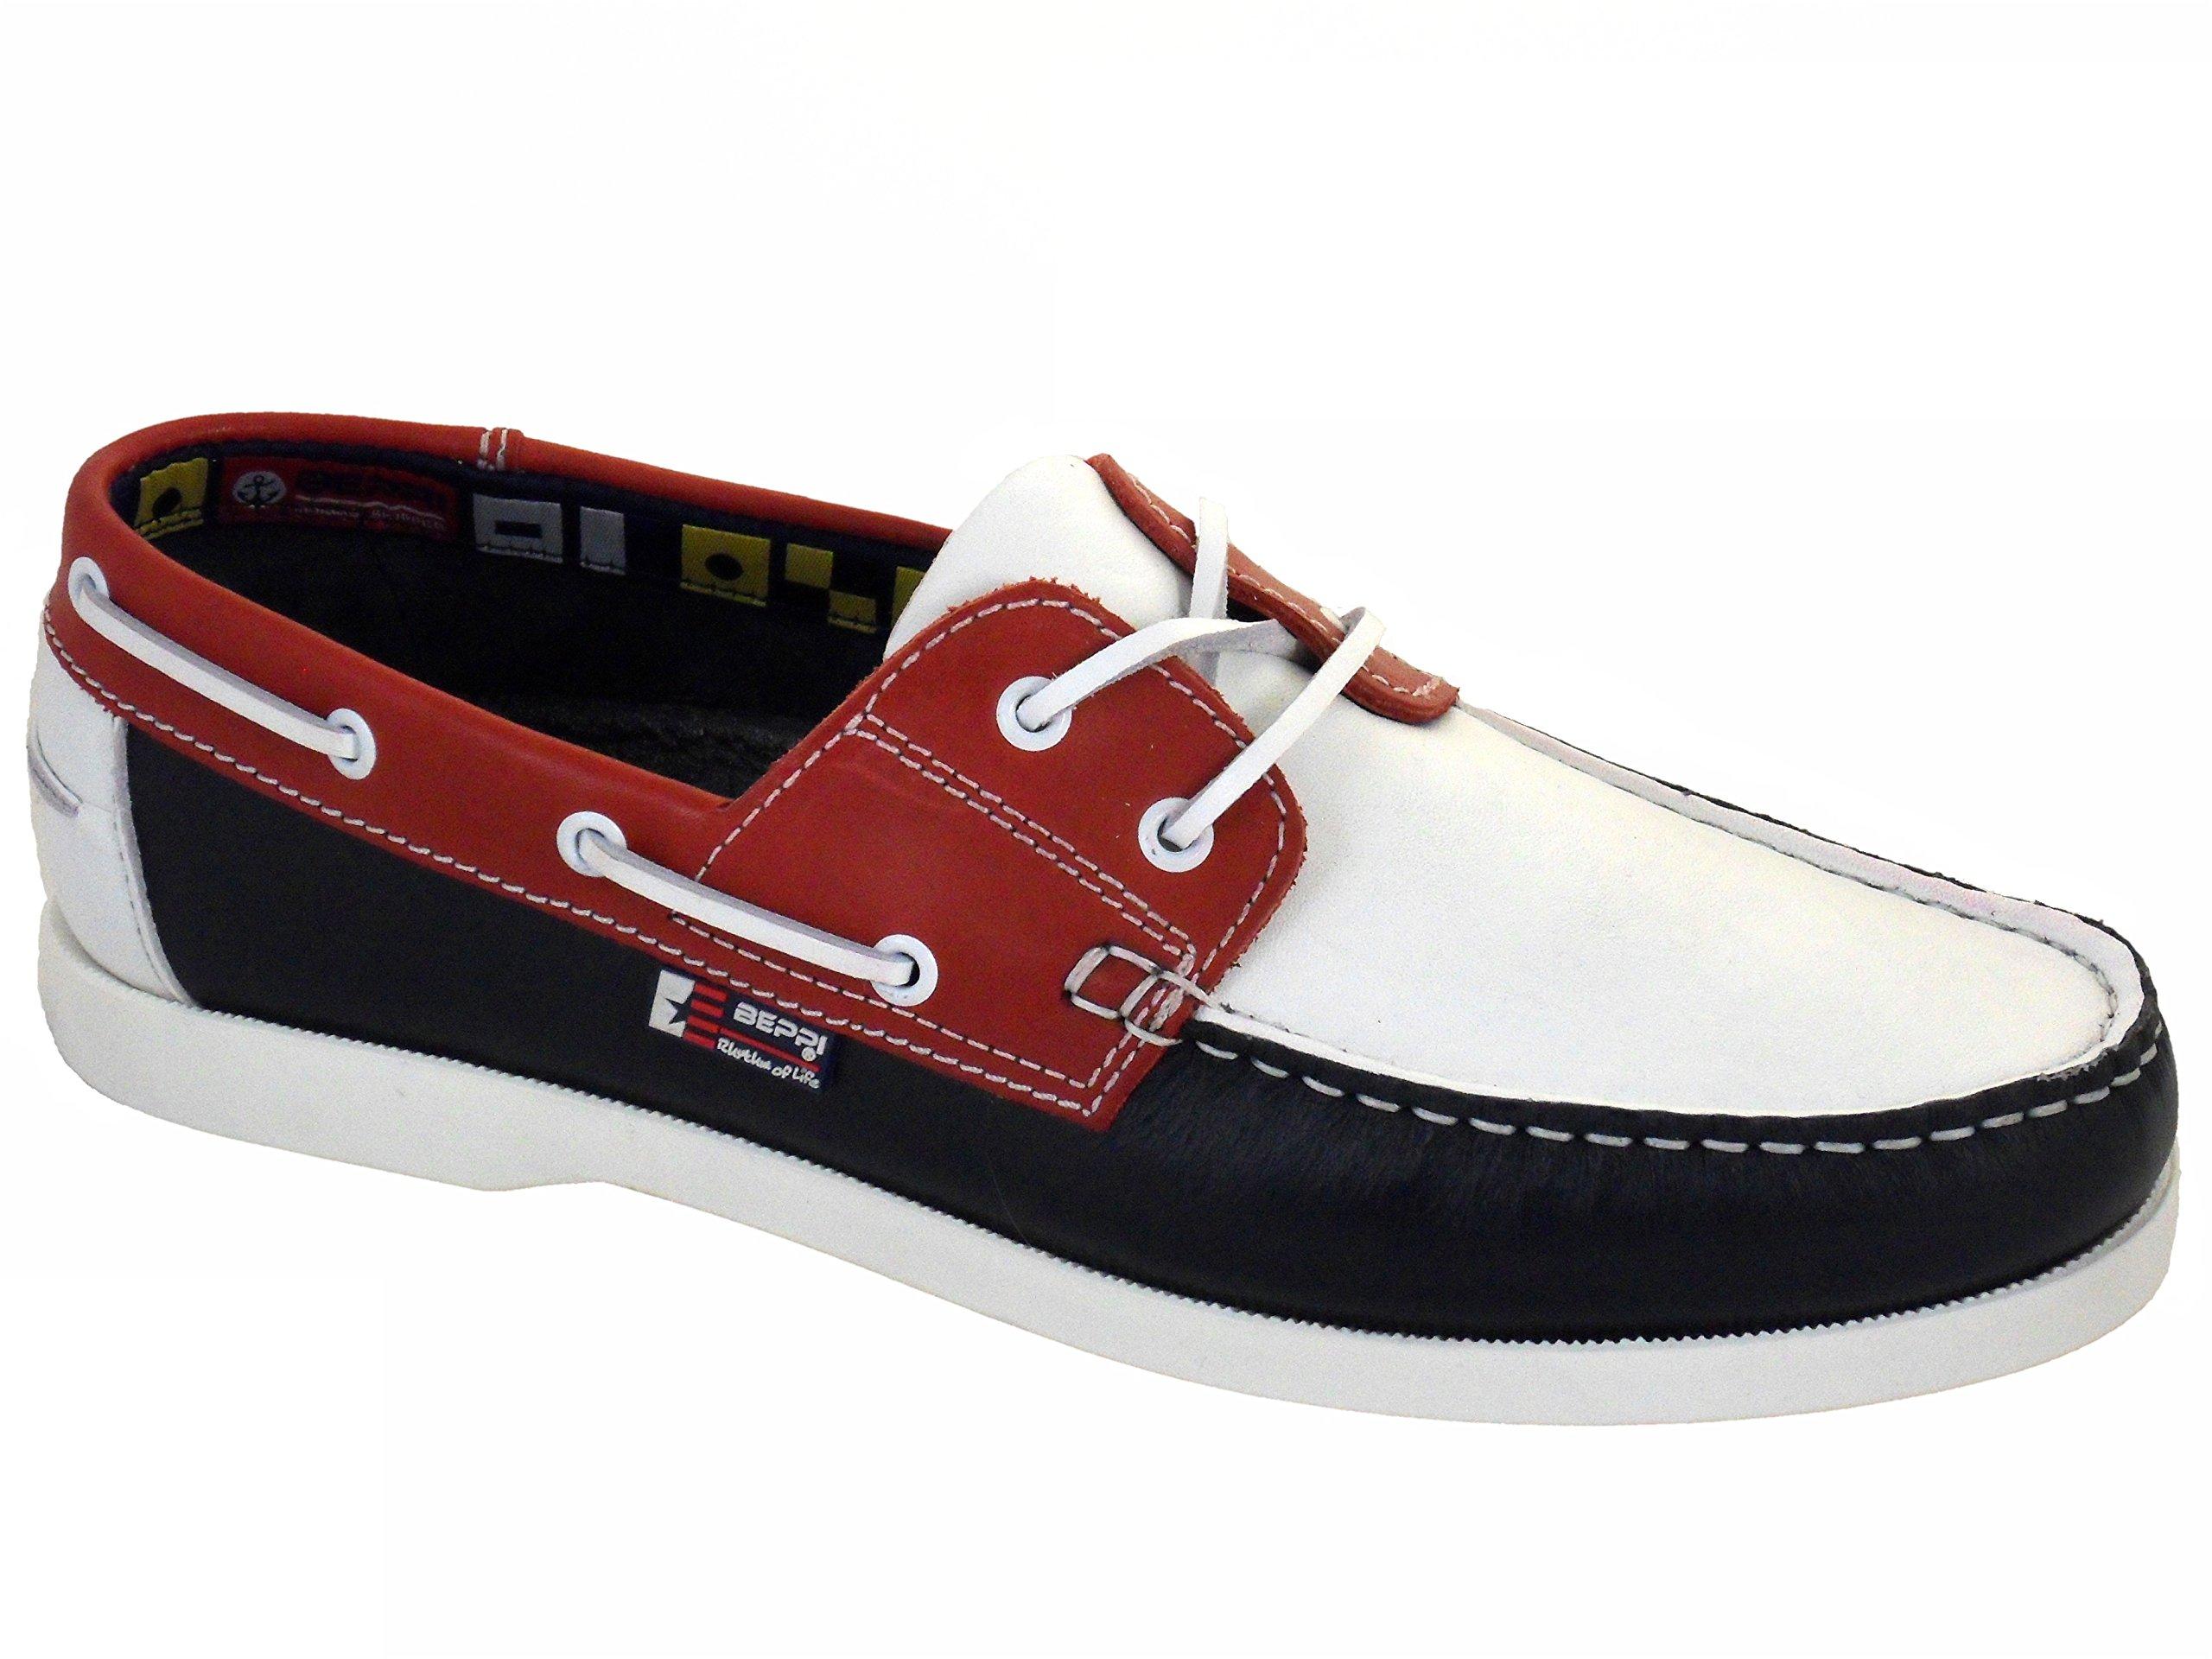 d55a2efe6e71 Beppi Portugiesisch Herren Leder Bootsschuhe Rot Weiß Blau product image